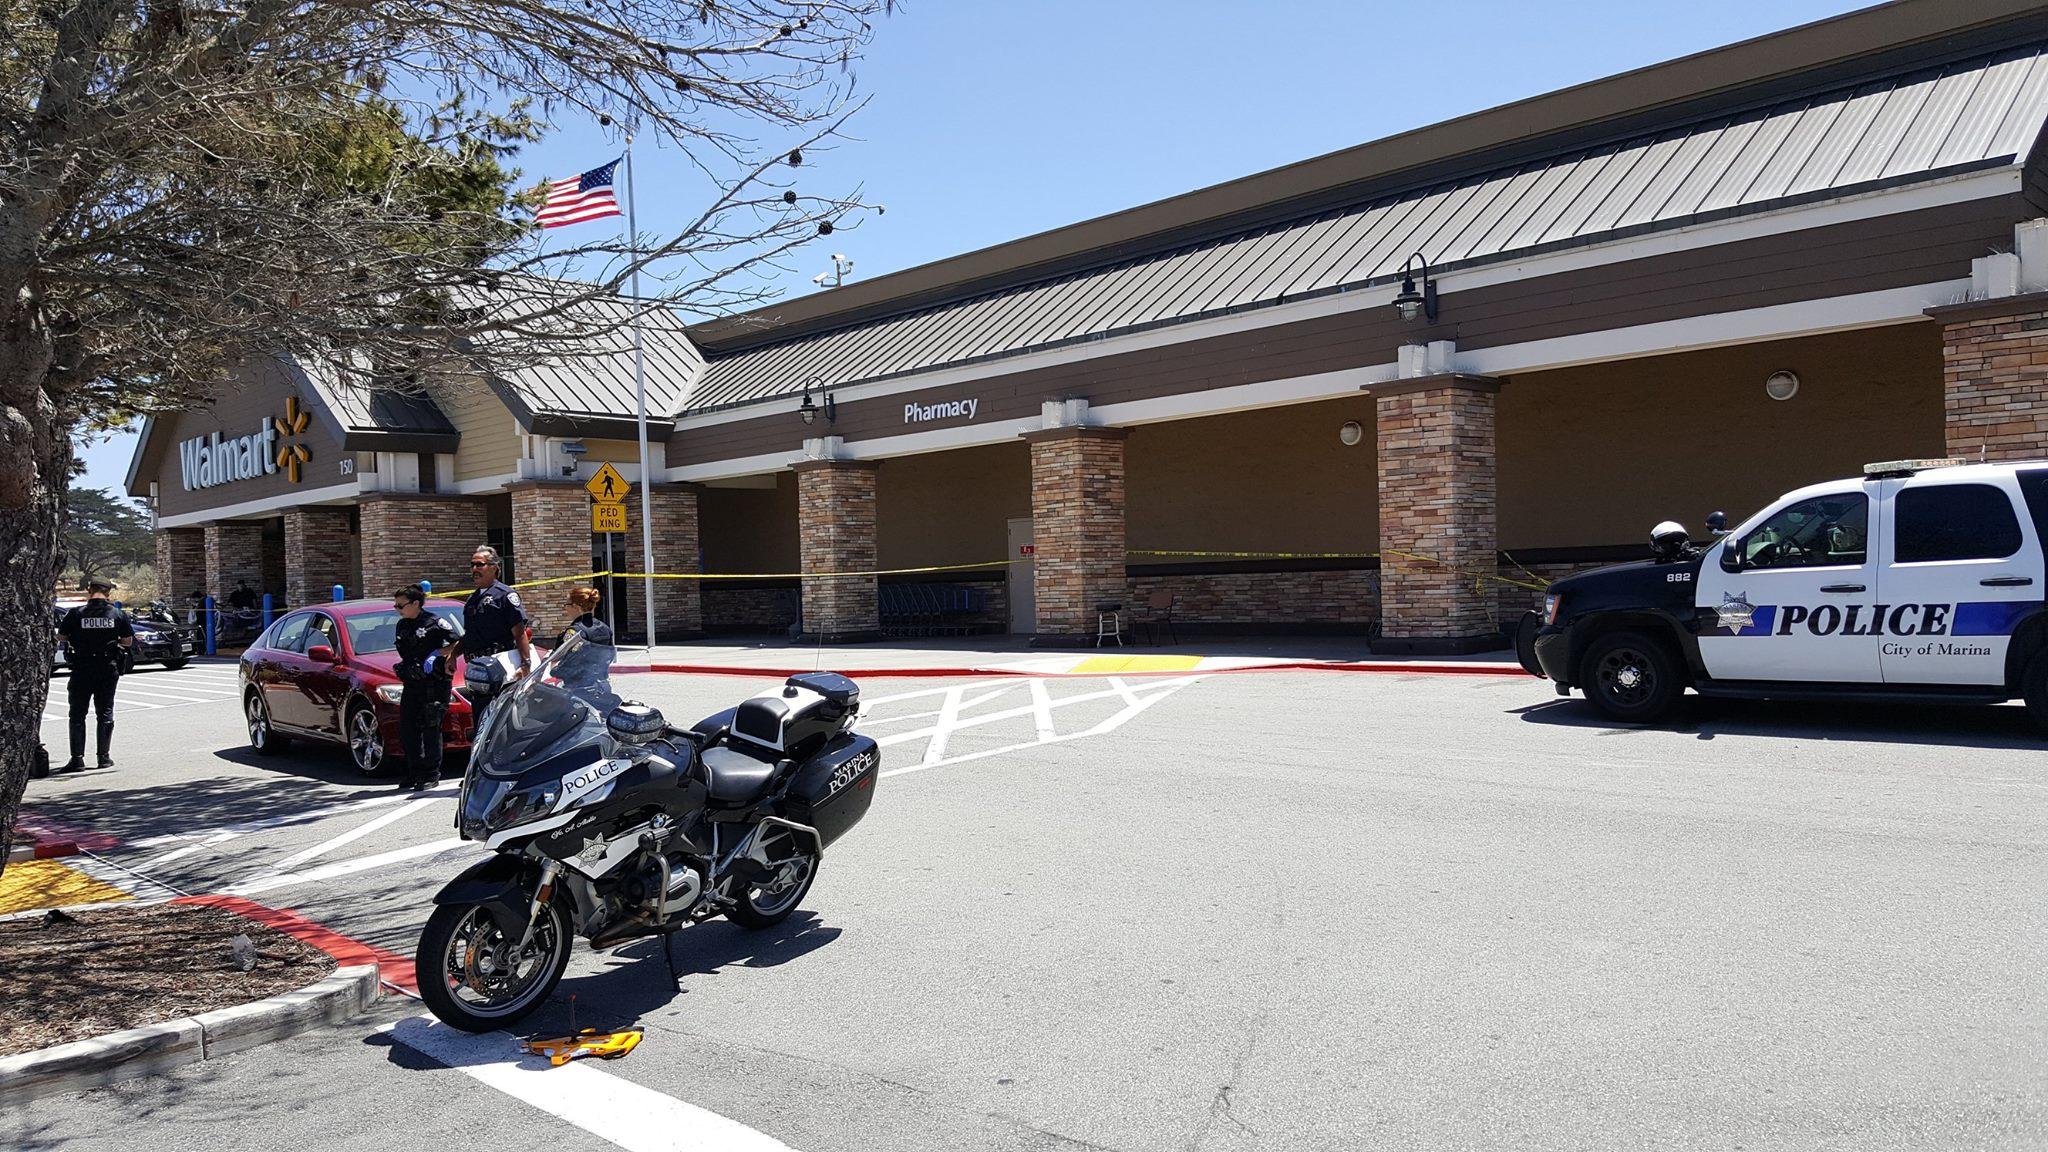 Pregnant woman dies after Wal-Mart parking lot crash